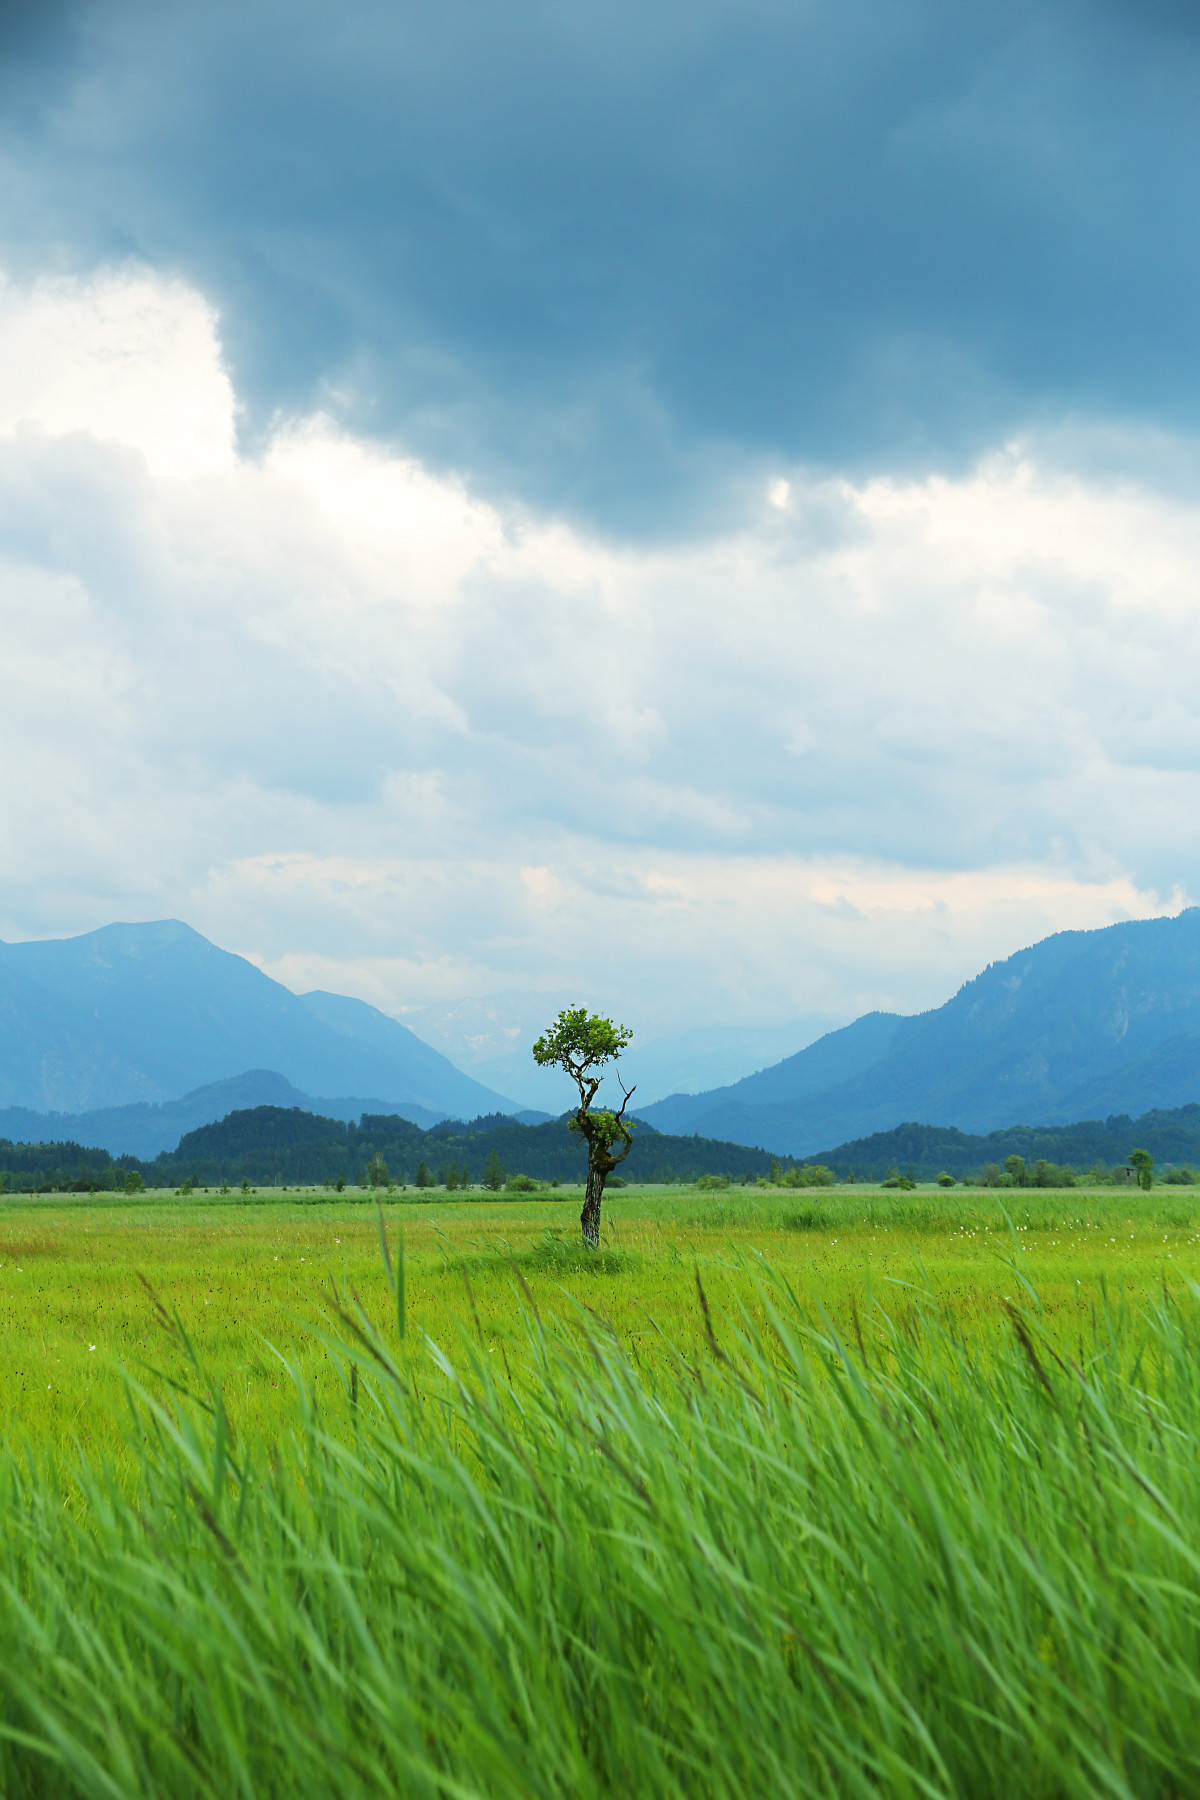 Gambar  pemandangan hutan gurun gunung bidang padang